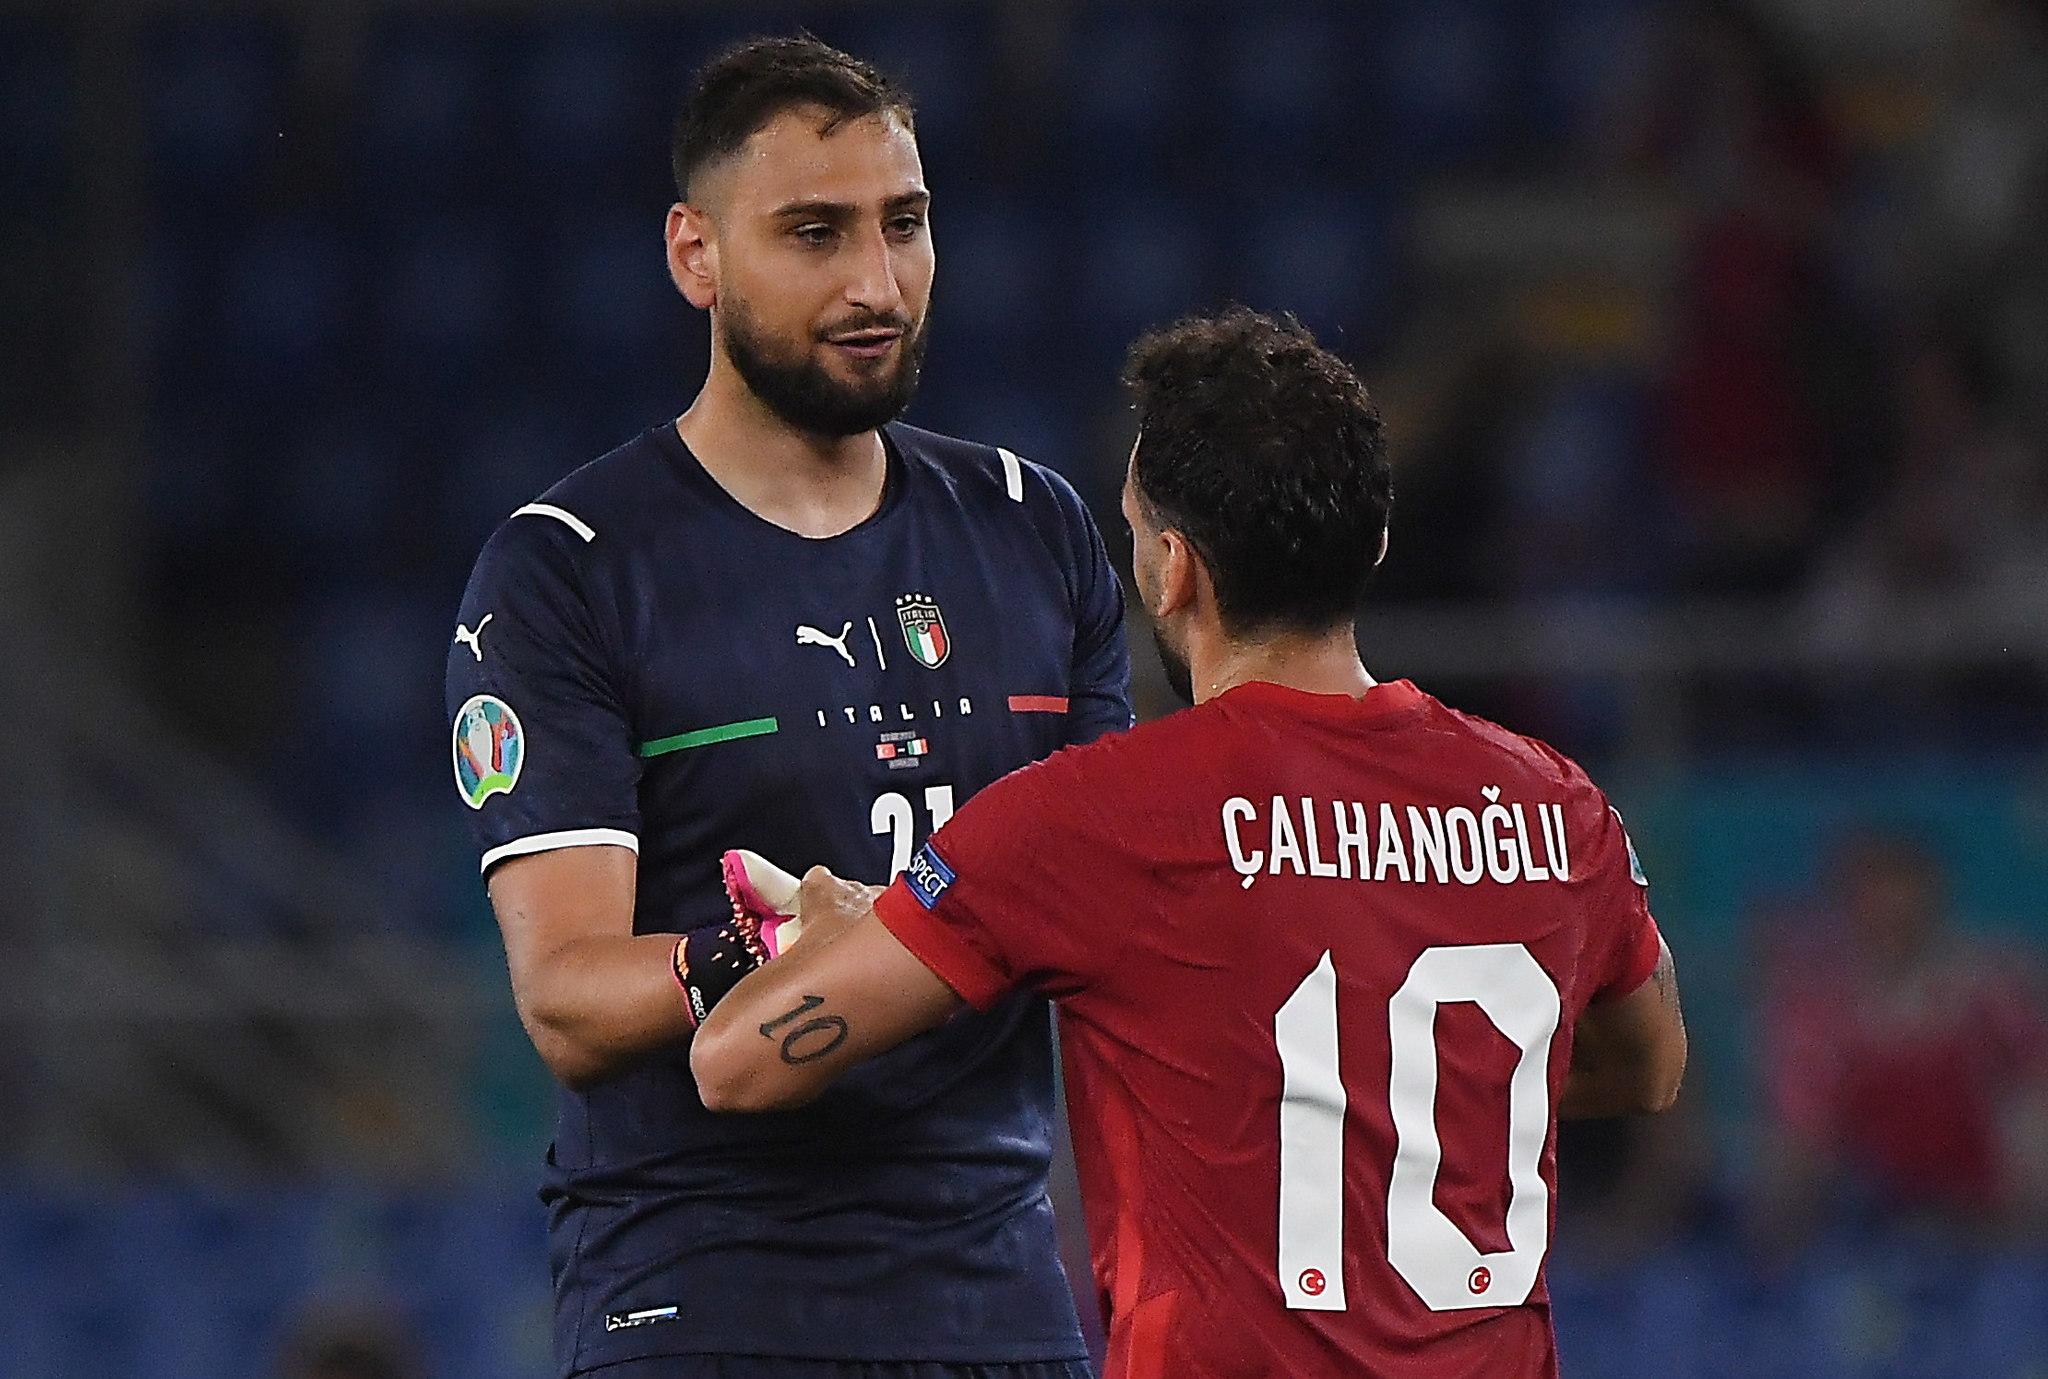 Serie A: Donnarumma and Calhanoglu exits mean AC Milan have to ...